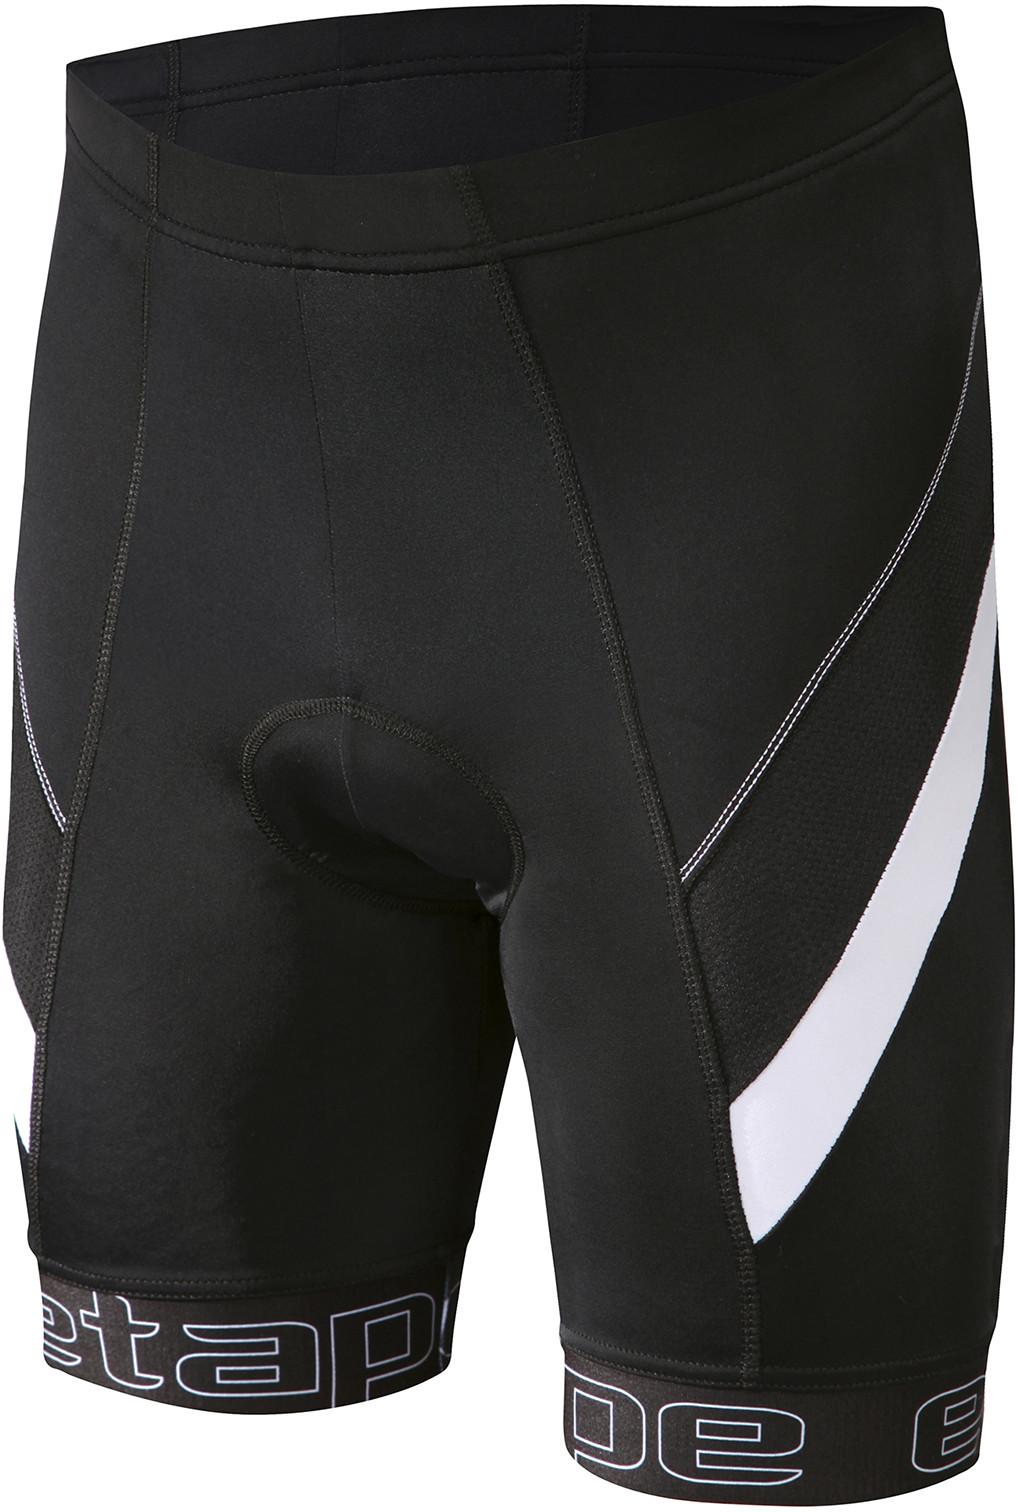 3e53bbbf076dd Etape spodenki rowerowe męskie Profi Pas black/white XXL